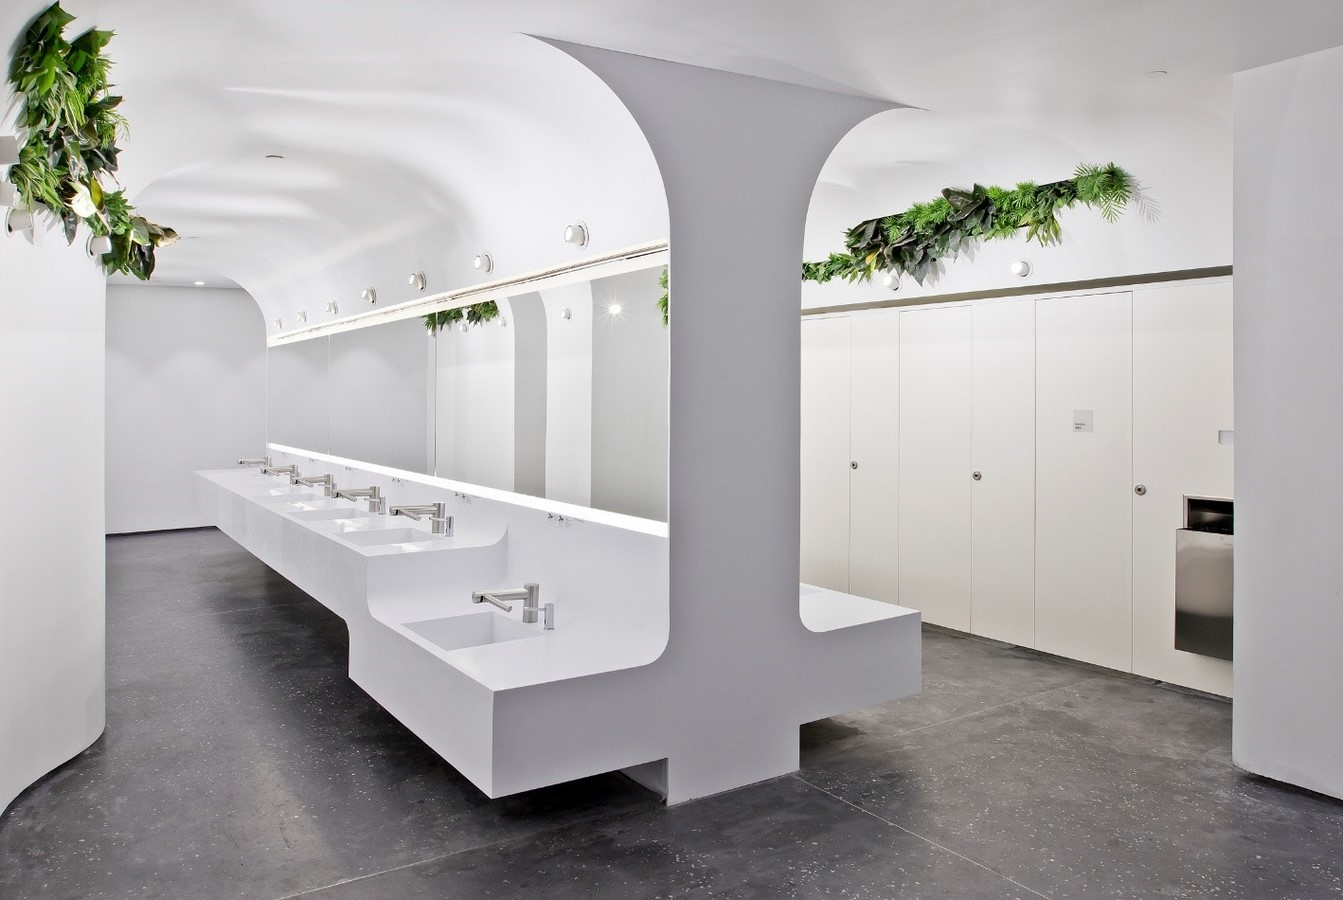 Public Toilet Aesthetics: An Important Urban Insert - Sheet1